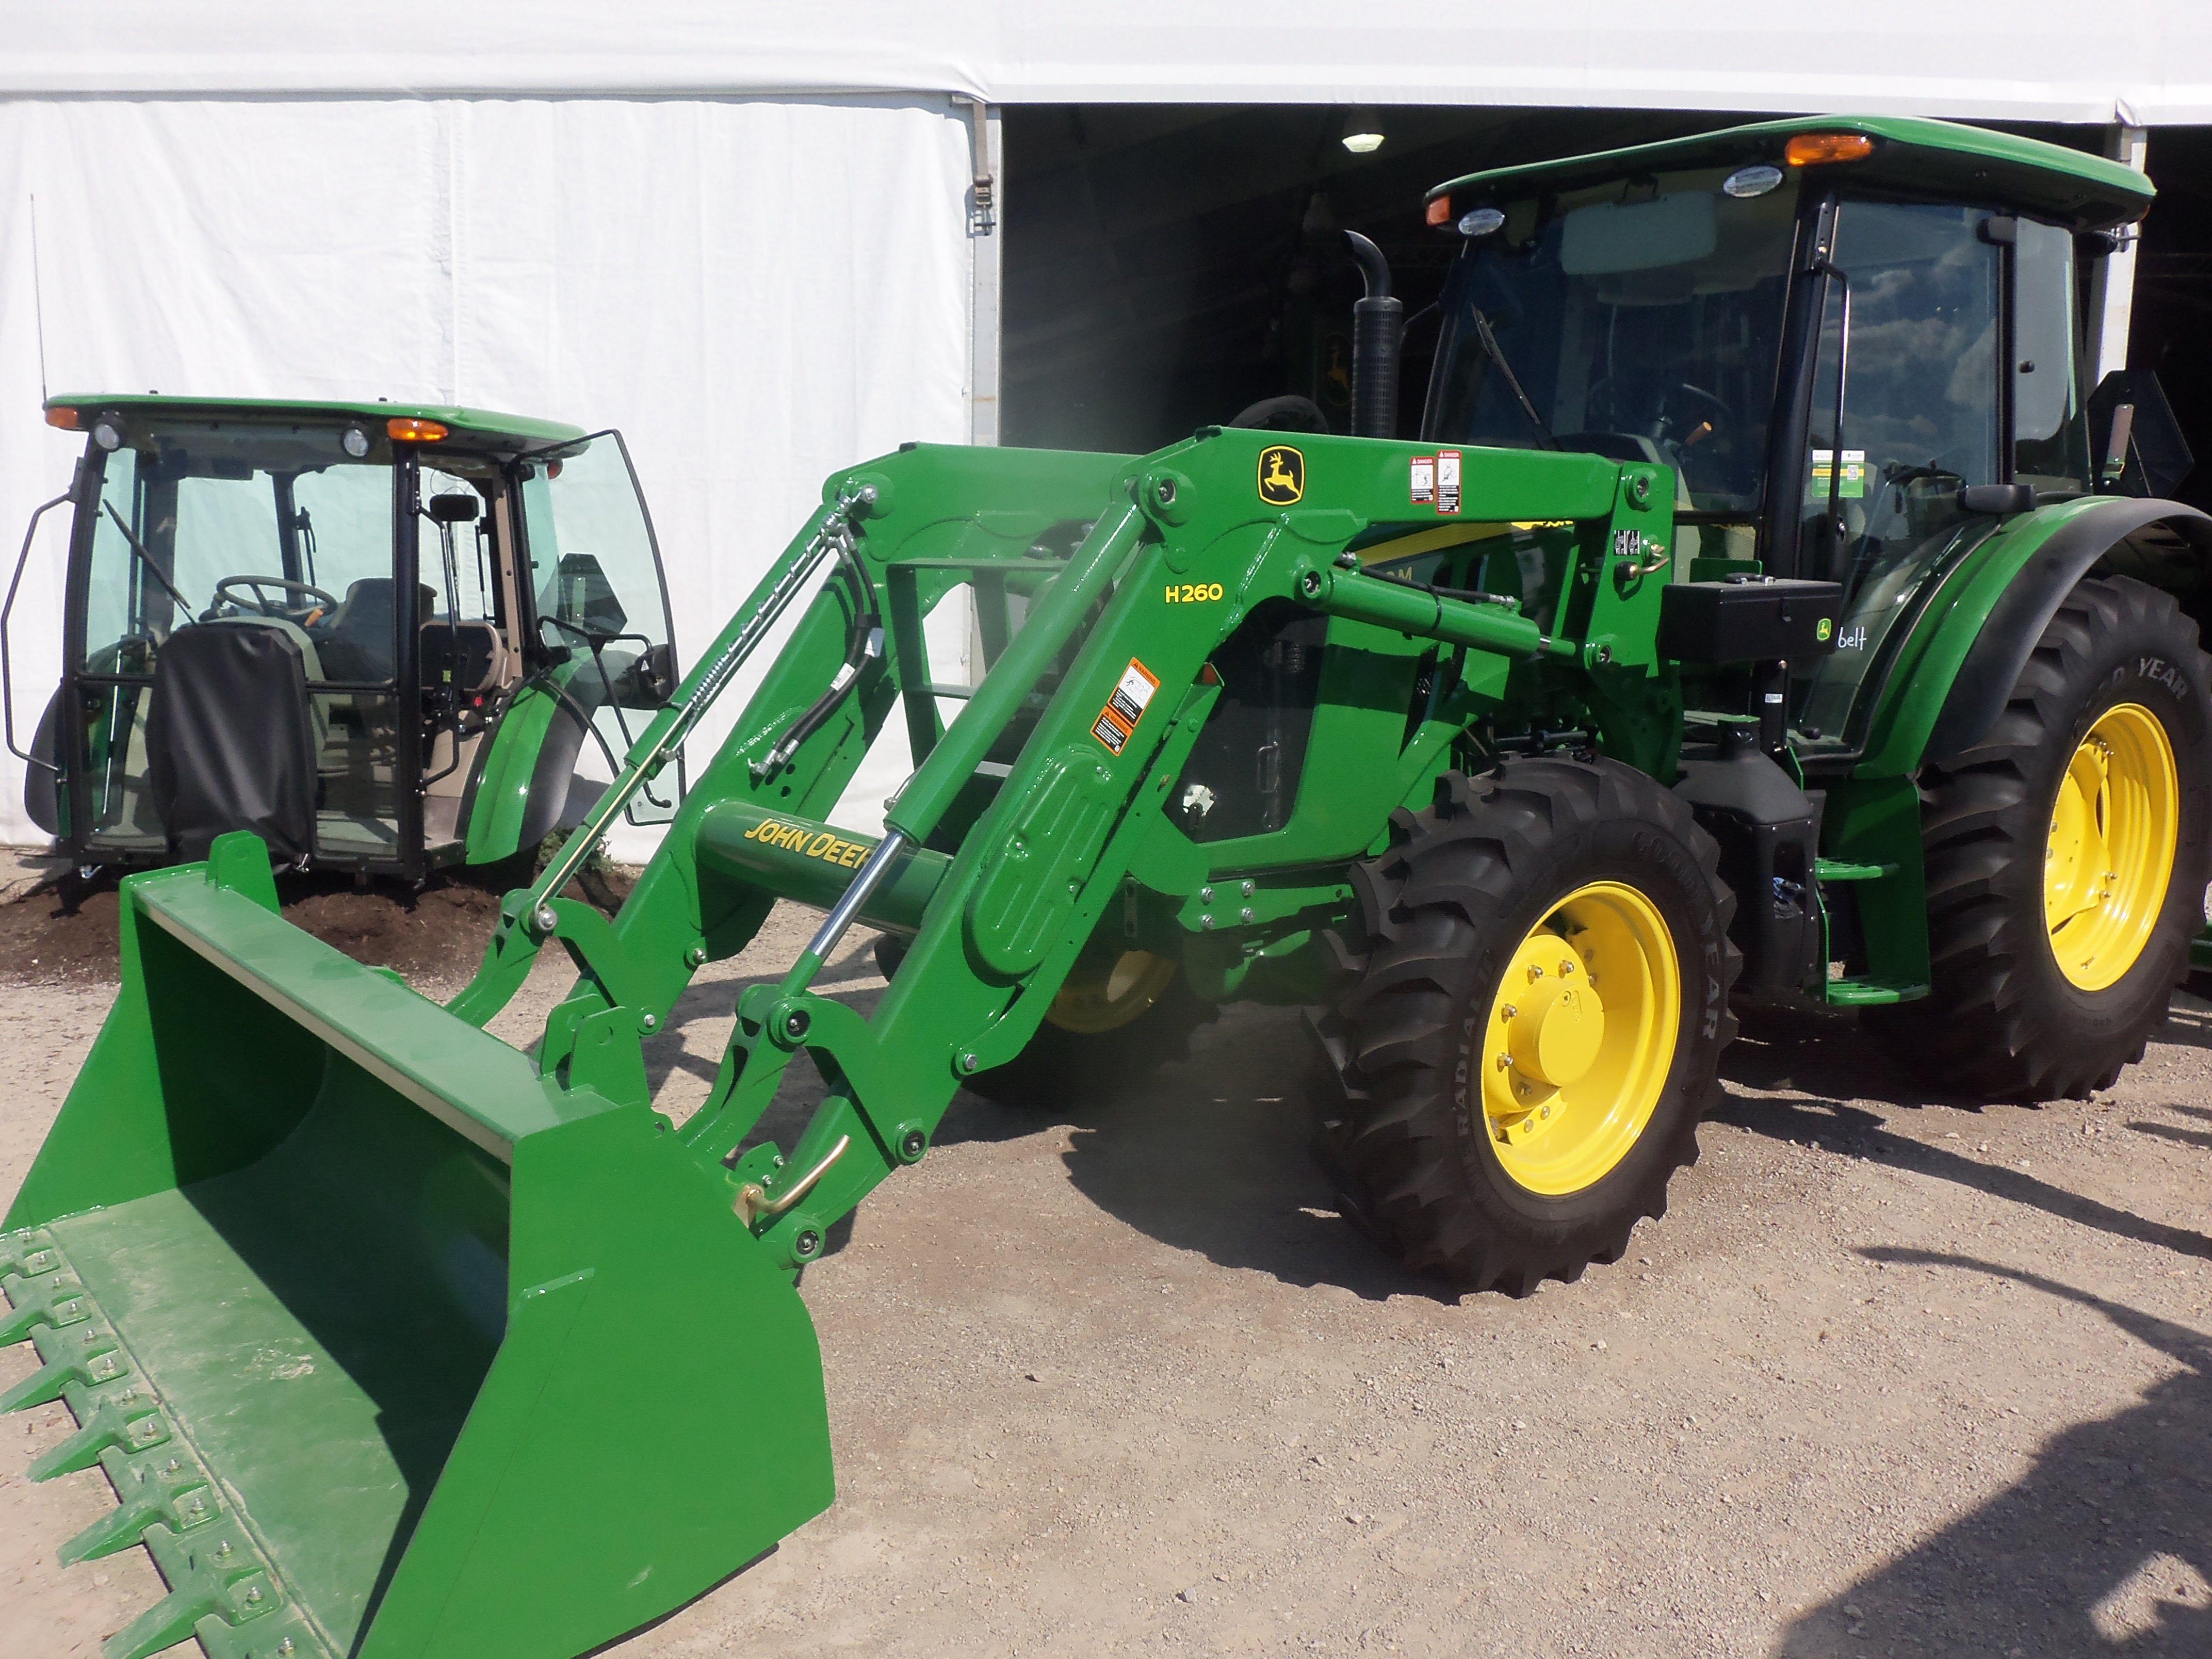 John Deere 5100M cab tractor & H260 loader